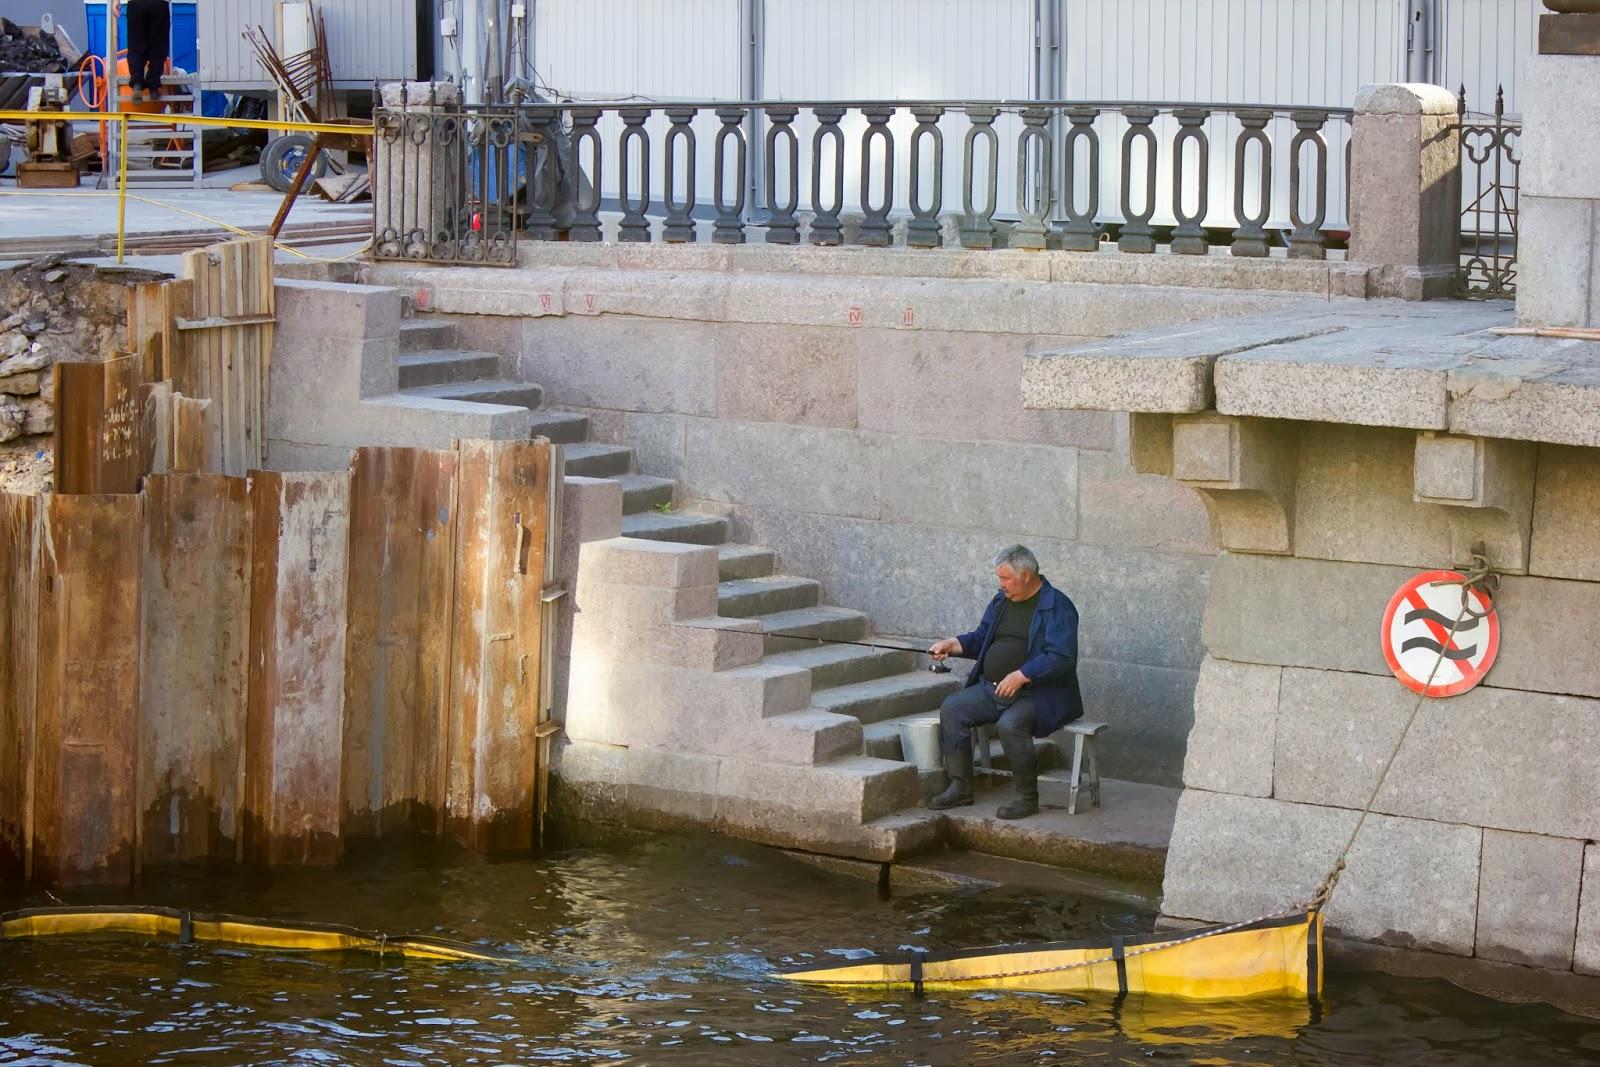 Санкт-Петербург, Россия, На рыбалке